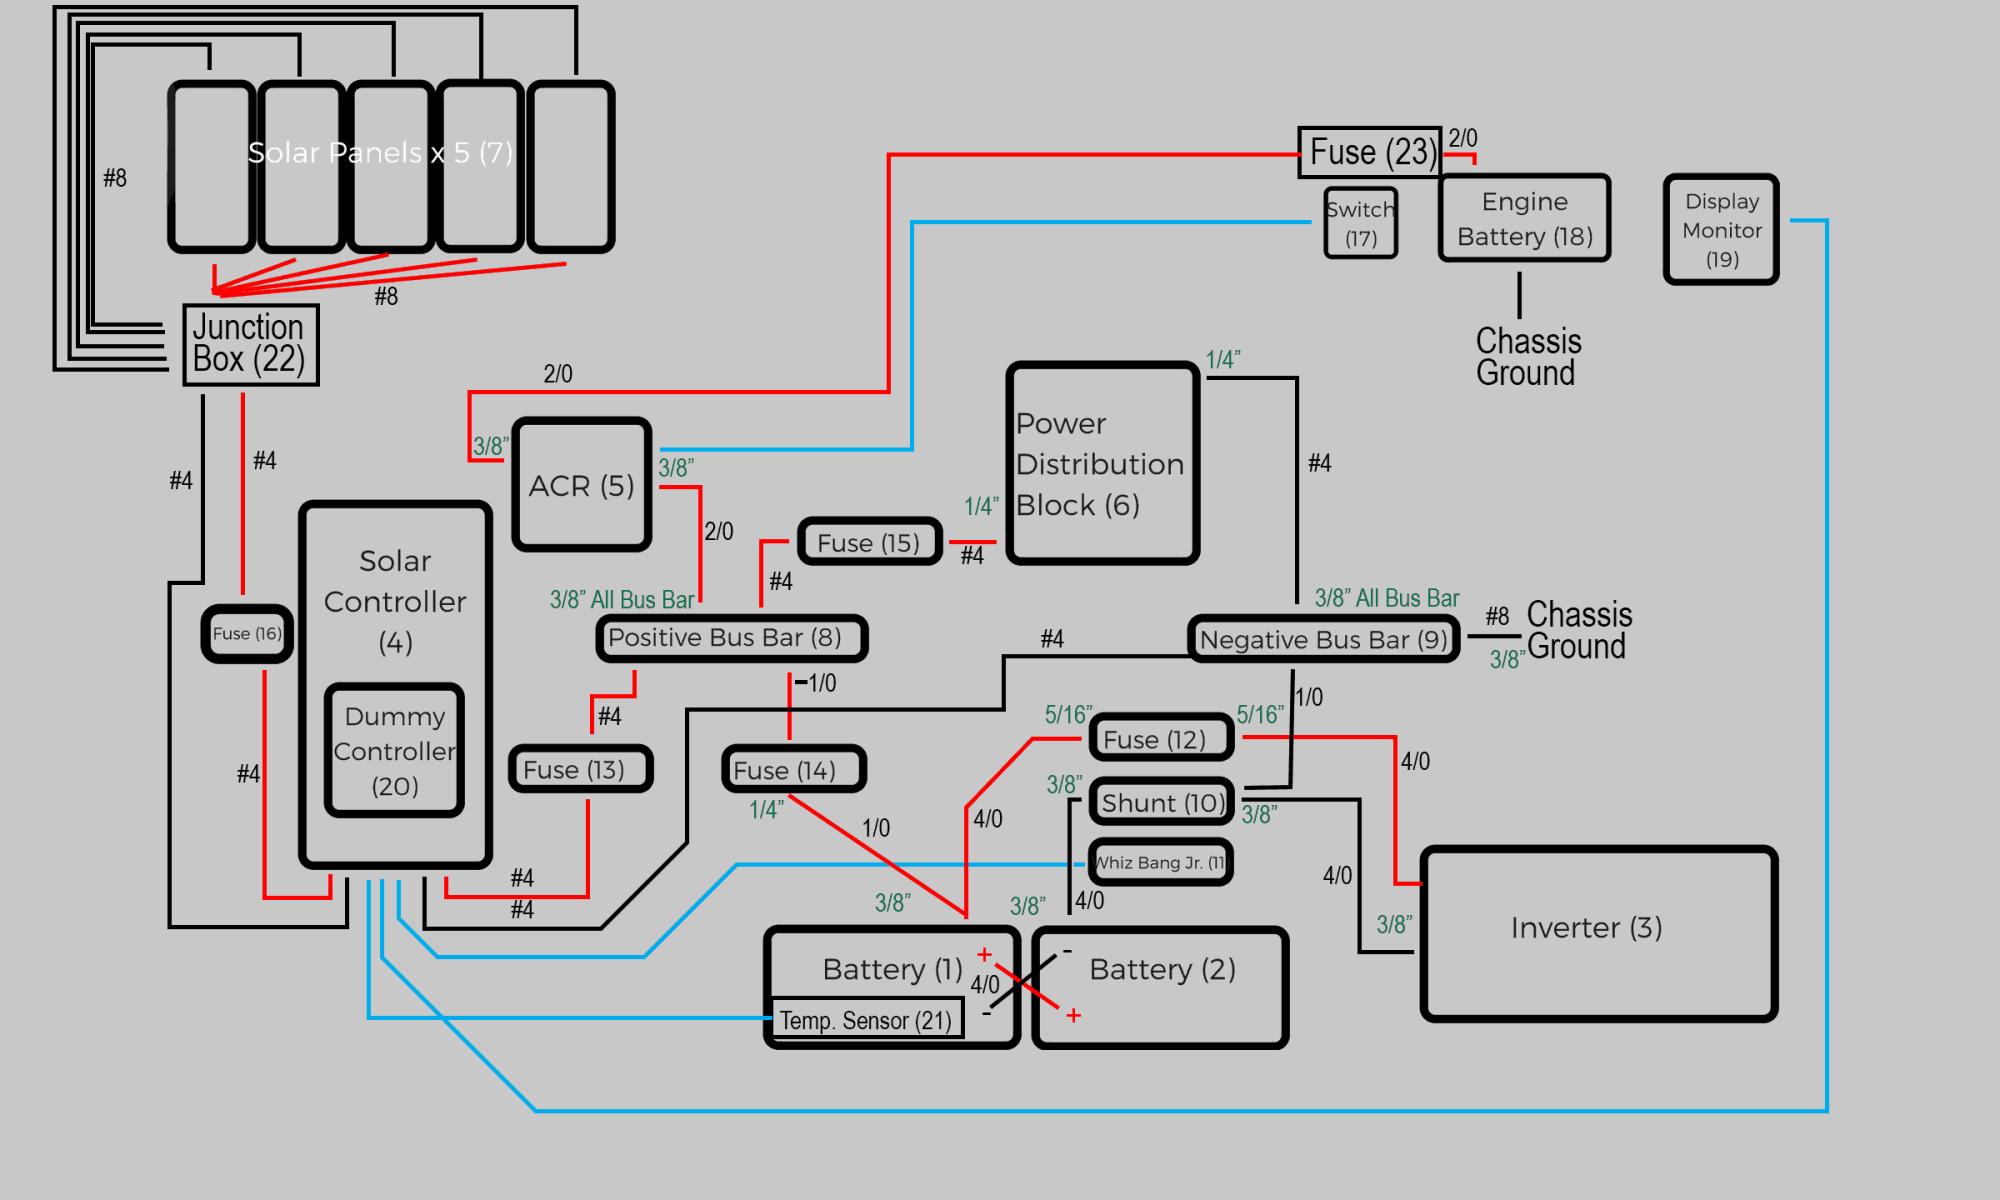 hight resolution of sprinter van wiring diagram wiring diagram todaysprinter van wiring diagram wiring diagram forward 2011 sprinter van